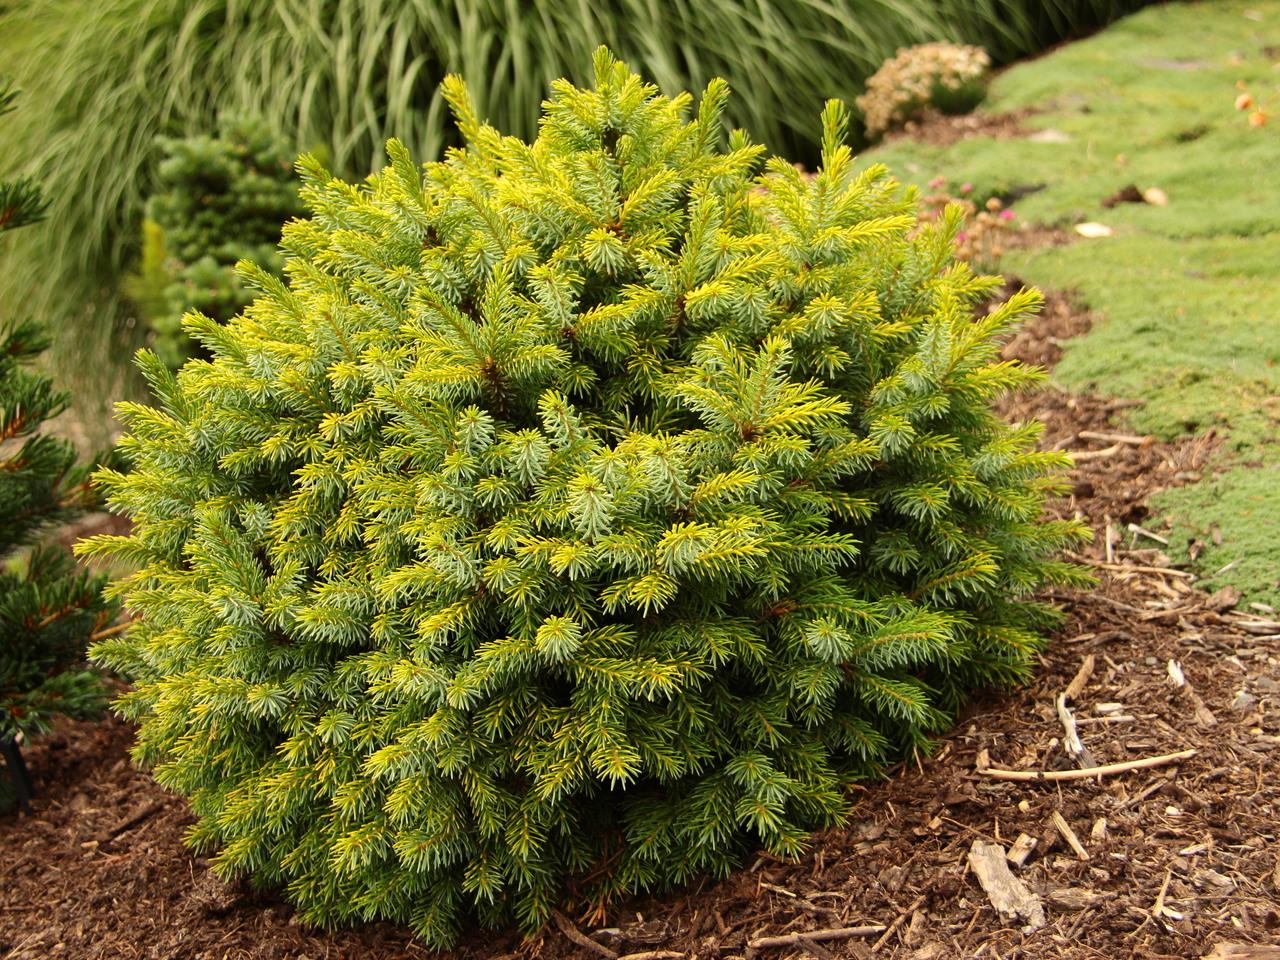 Picea omorika Peve Tijn evergreen conifer blue/green